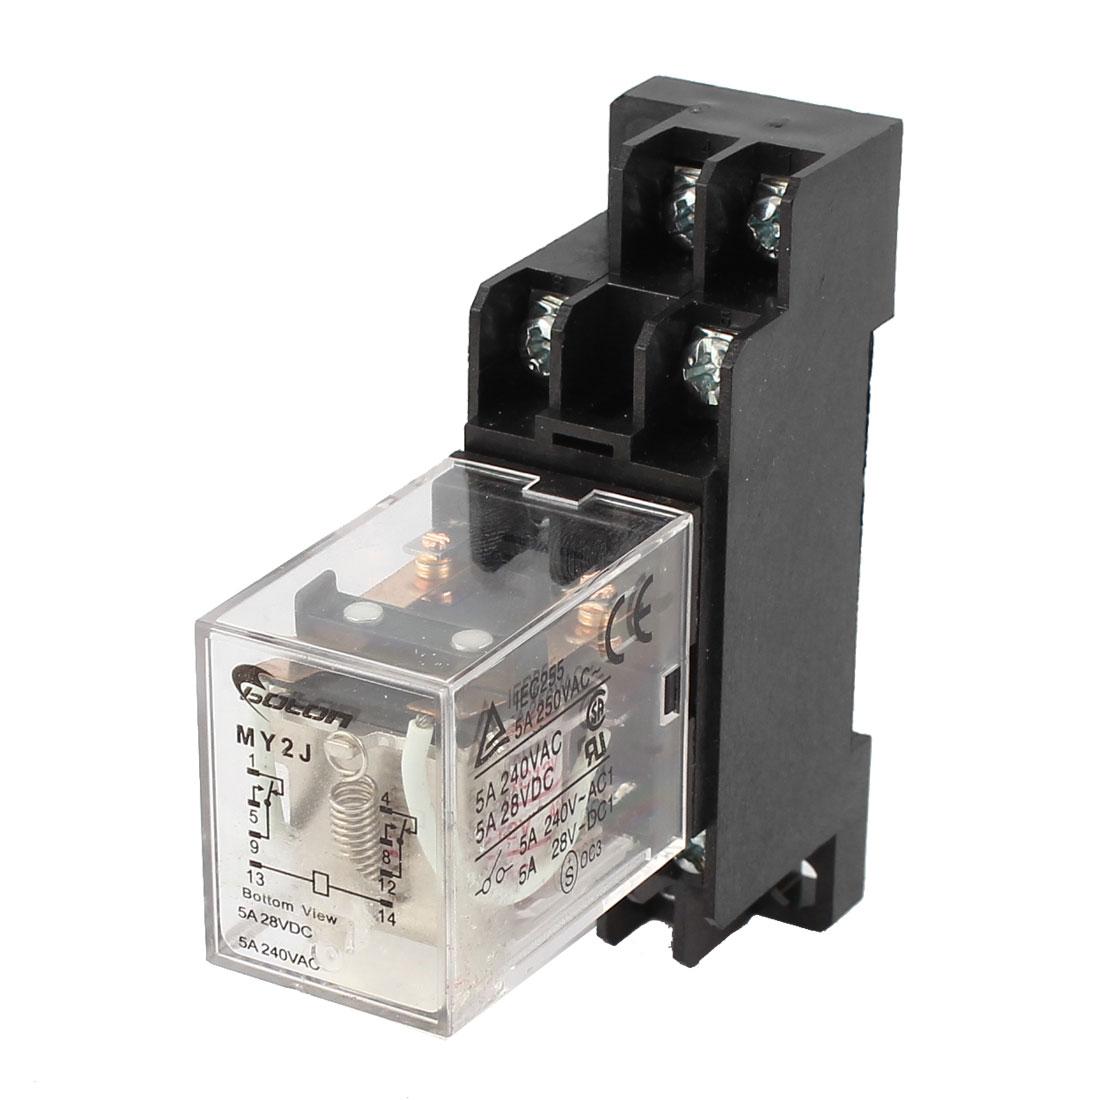 MY2J-AC12V Coil General Purpose Power Relay 8Pin 5A AC240V DC28V w Socket